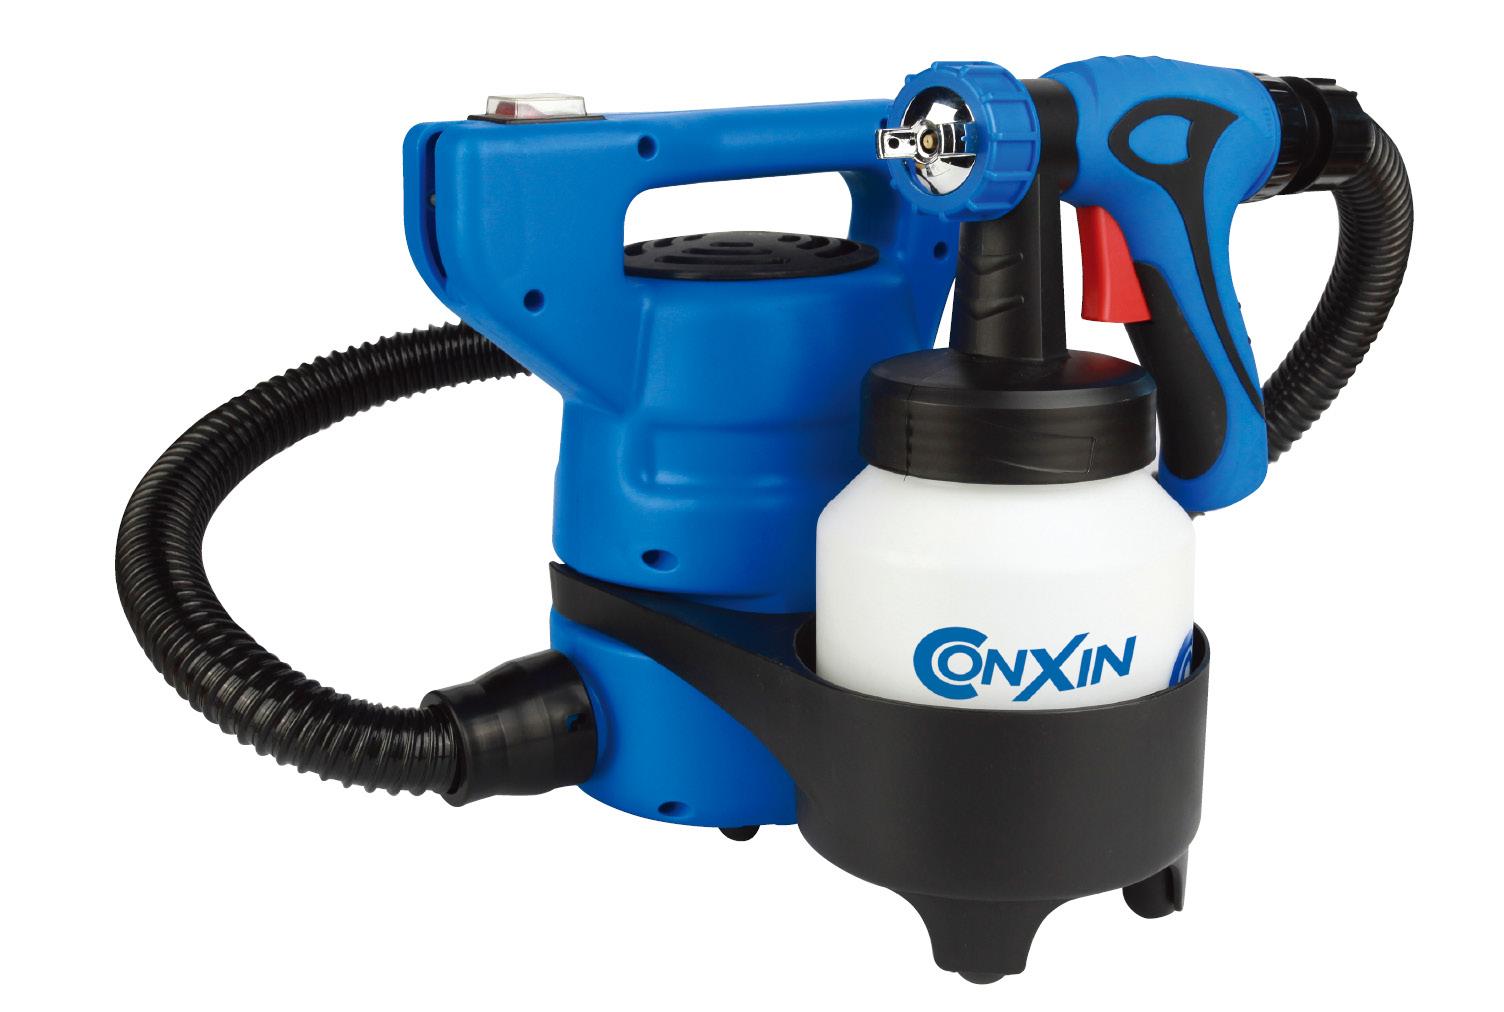 Hot electric paint spray gun oil spray gun wall paint for Spray gun for oil based paints